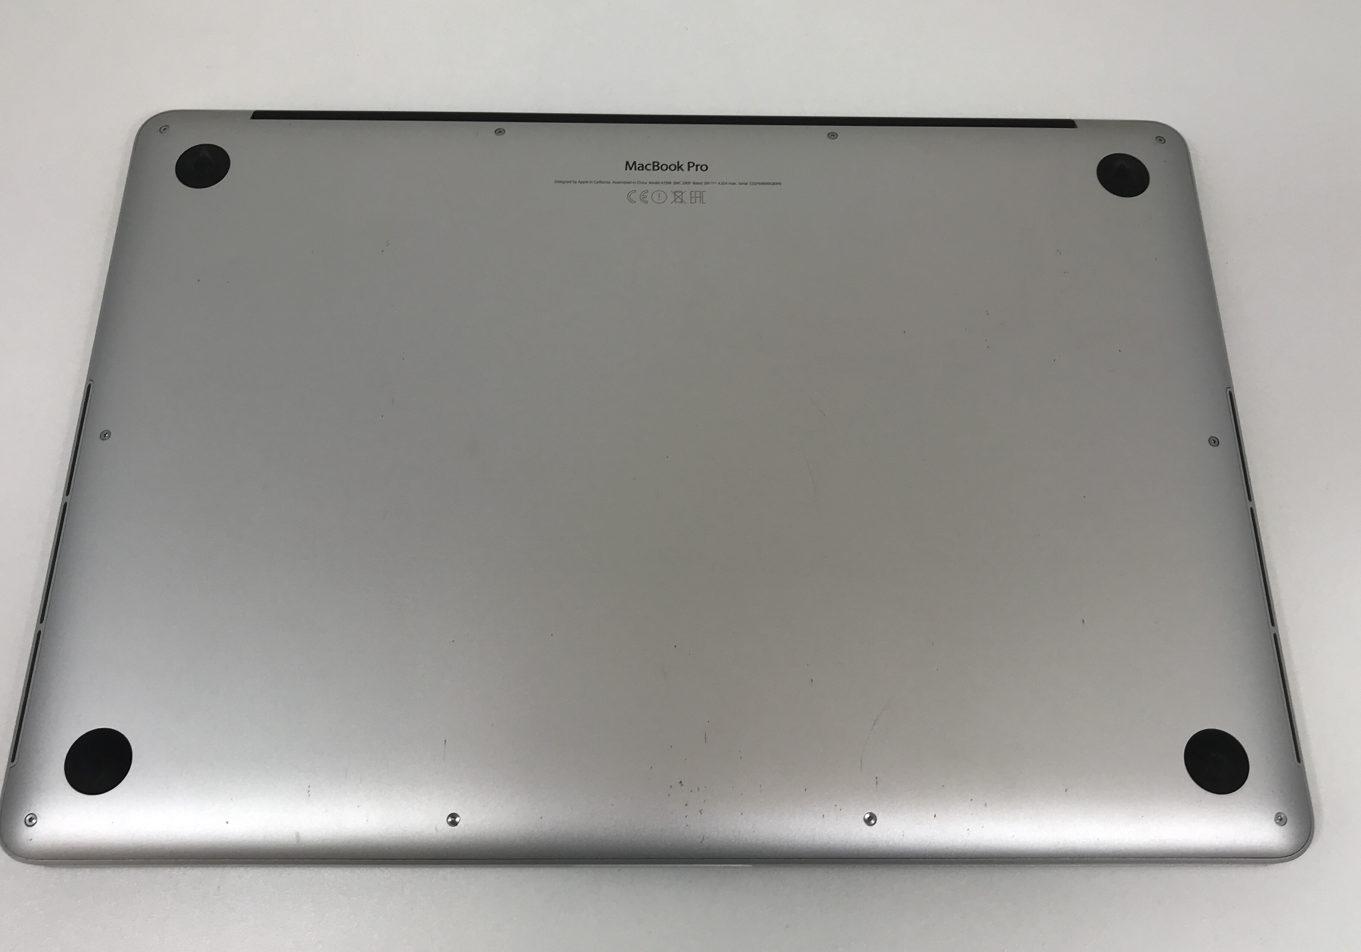 MacBook Pro (Retina 15-inch Mid 2015), 2.2GHz Intel Quad-Core i7, 16GB, 256GB SSD, Afbeelding 2